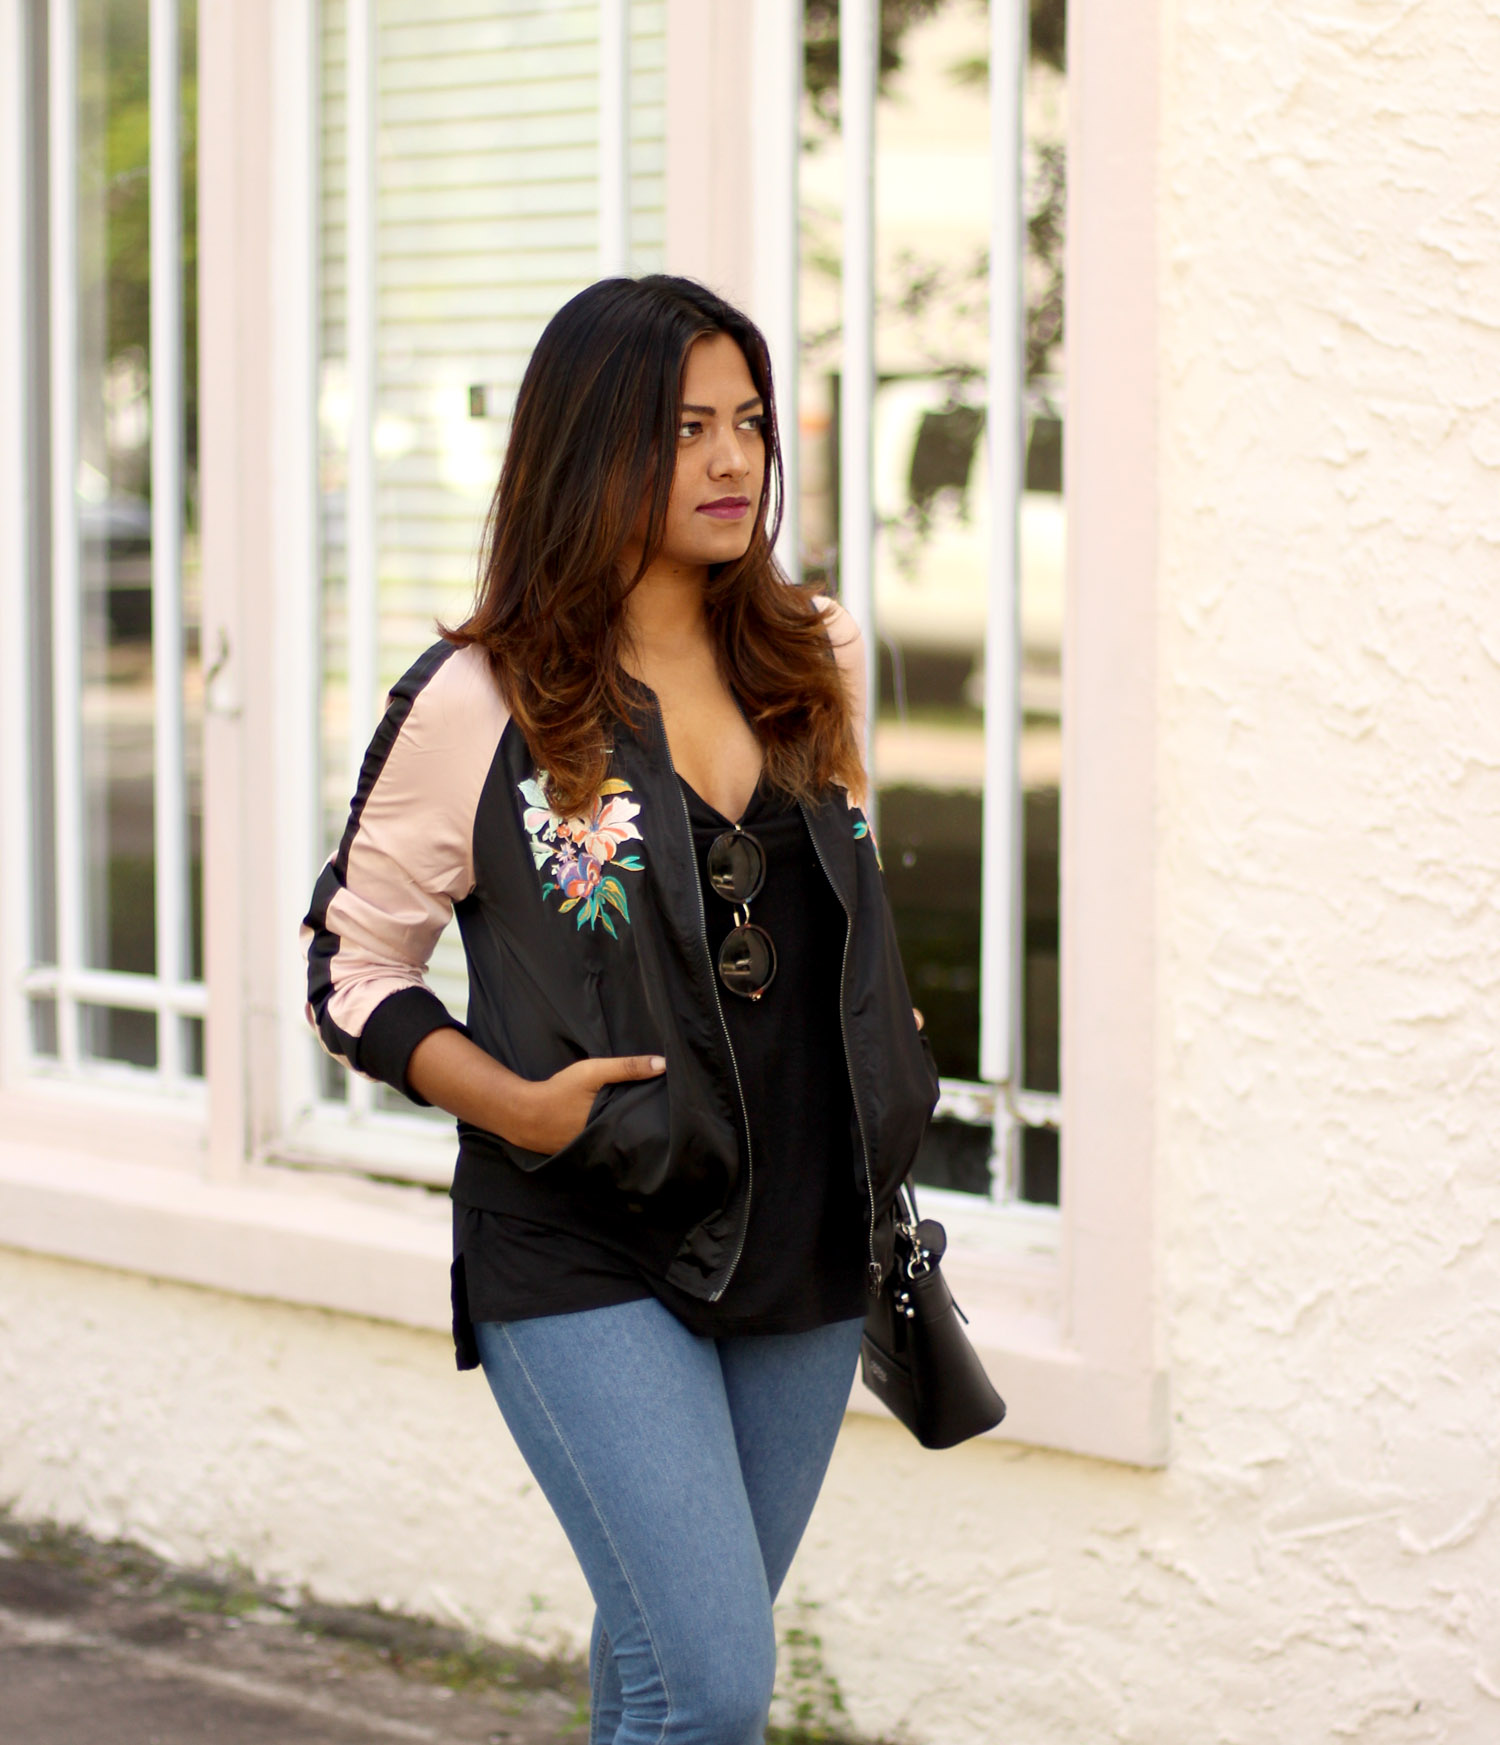 afroza-khan-miami-top-fashion-blogger